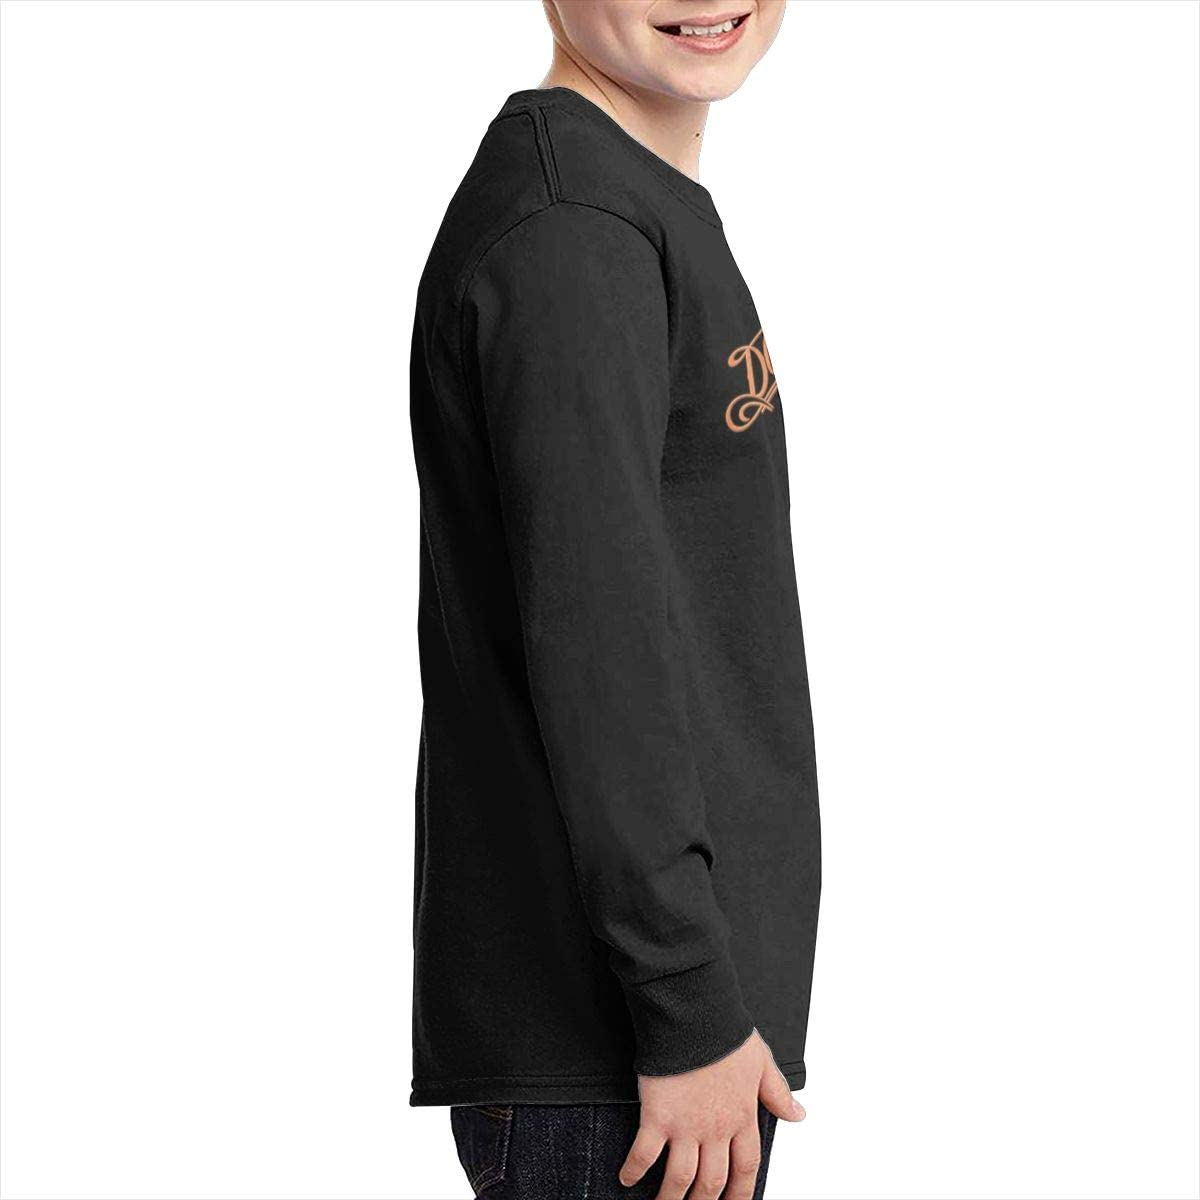 MichaelHazzard Don Williams Logo Youth Fun Long Sleeve Crewneck Tee T-Shirt for Boys and Girls